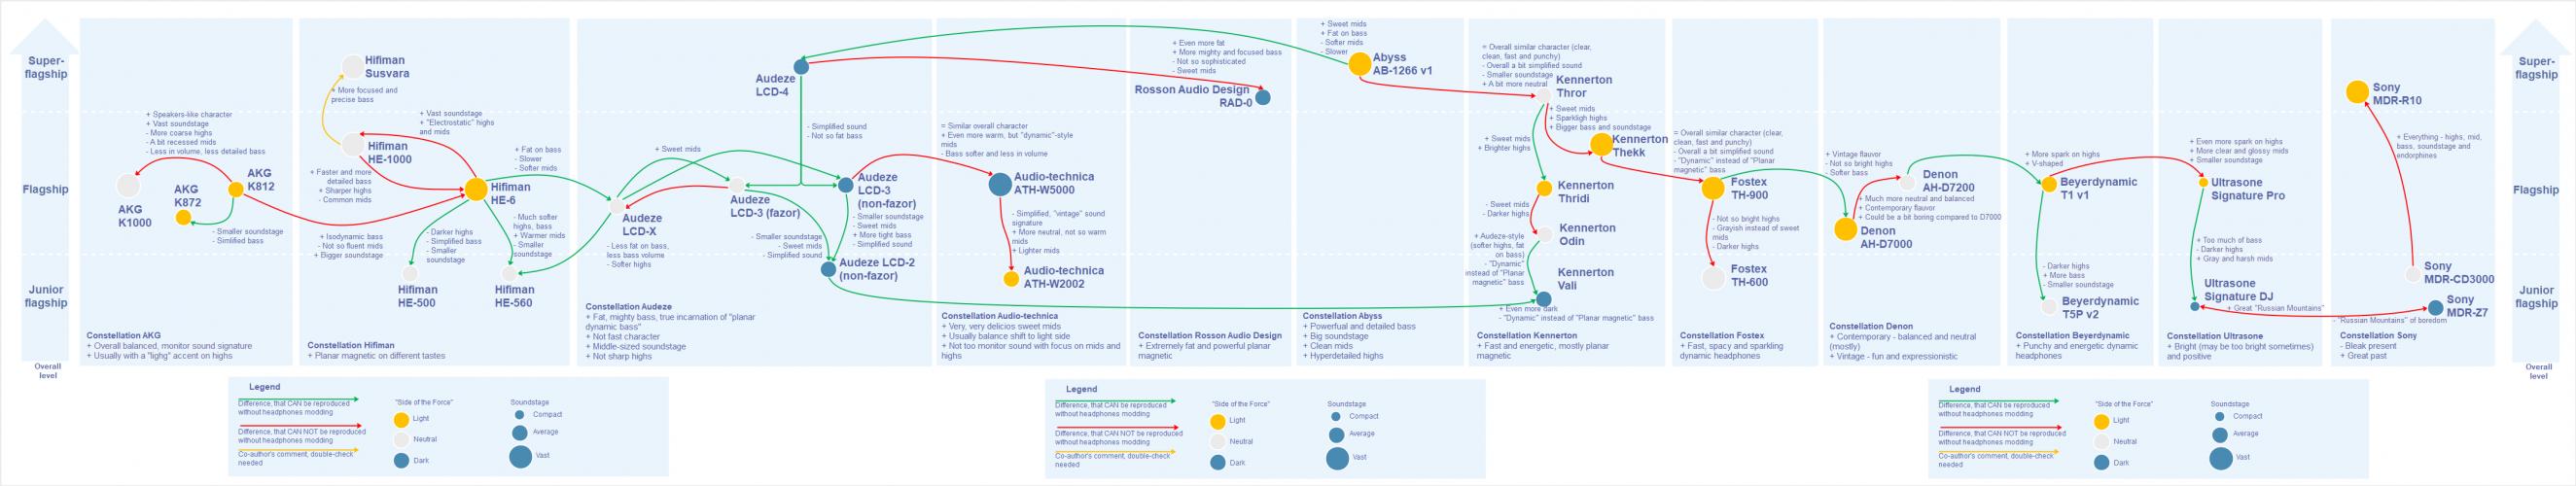 HP starmap 20210222.png